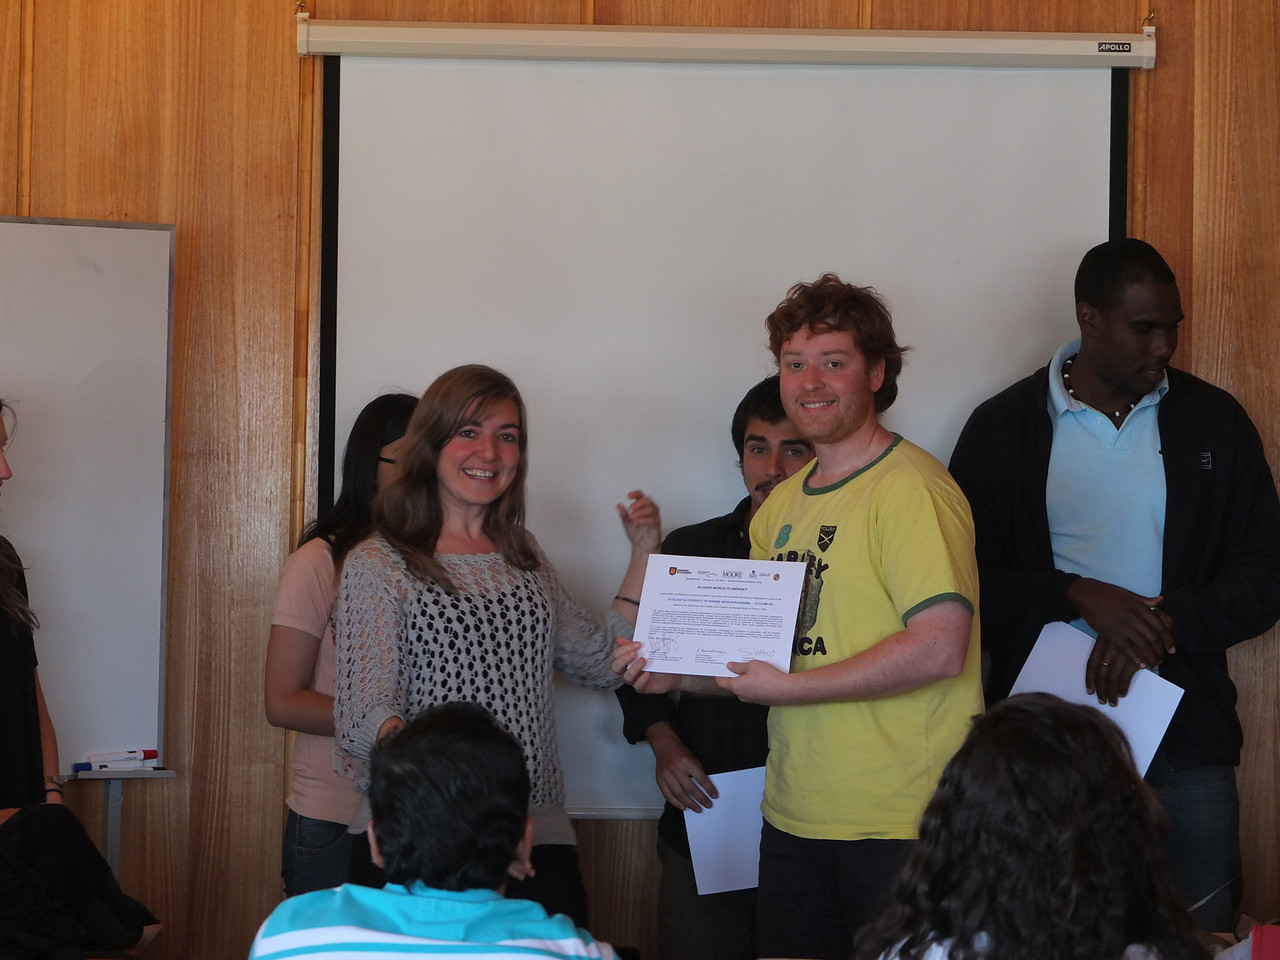 Final report and graduation